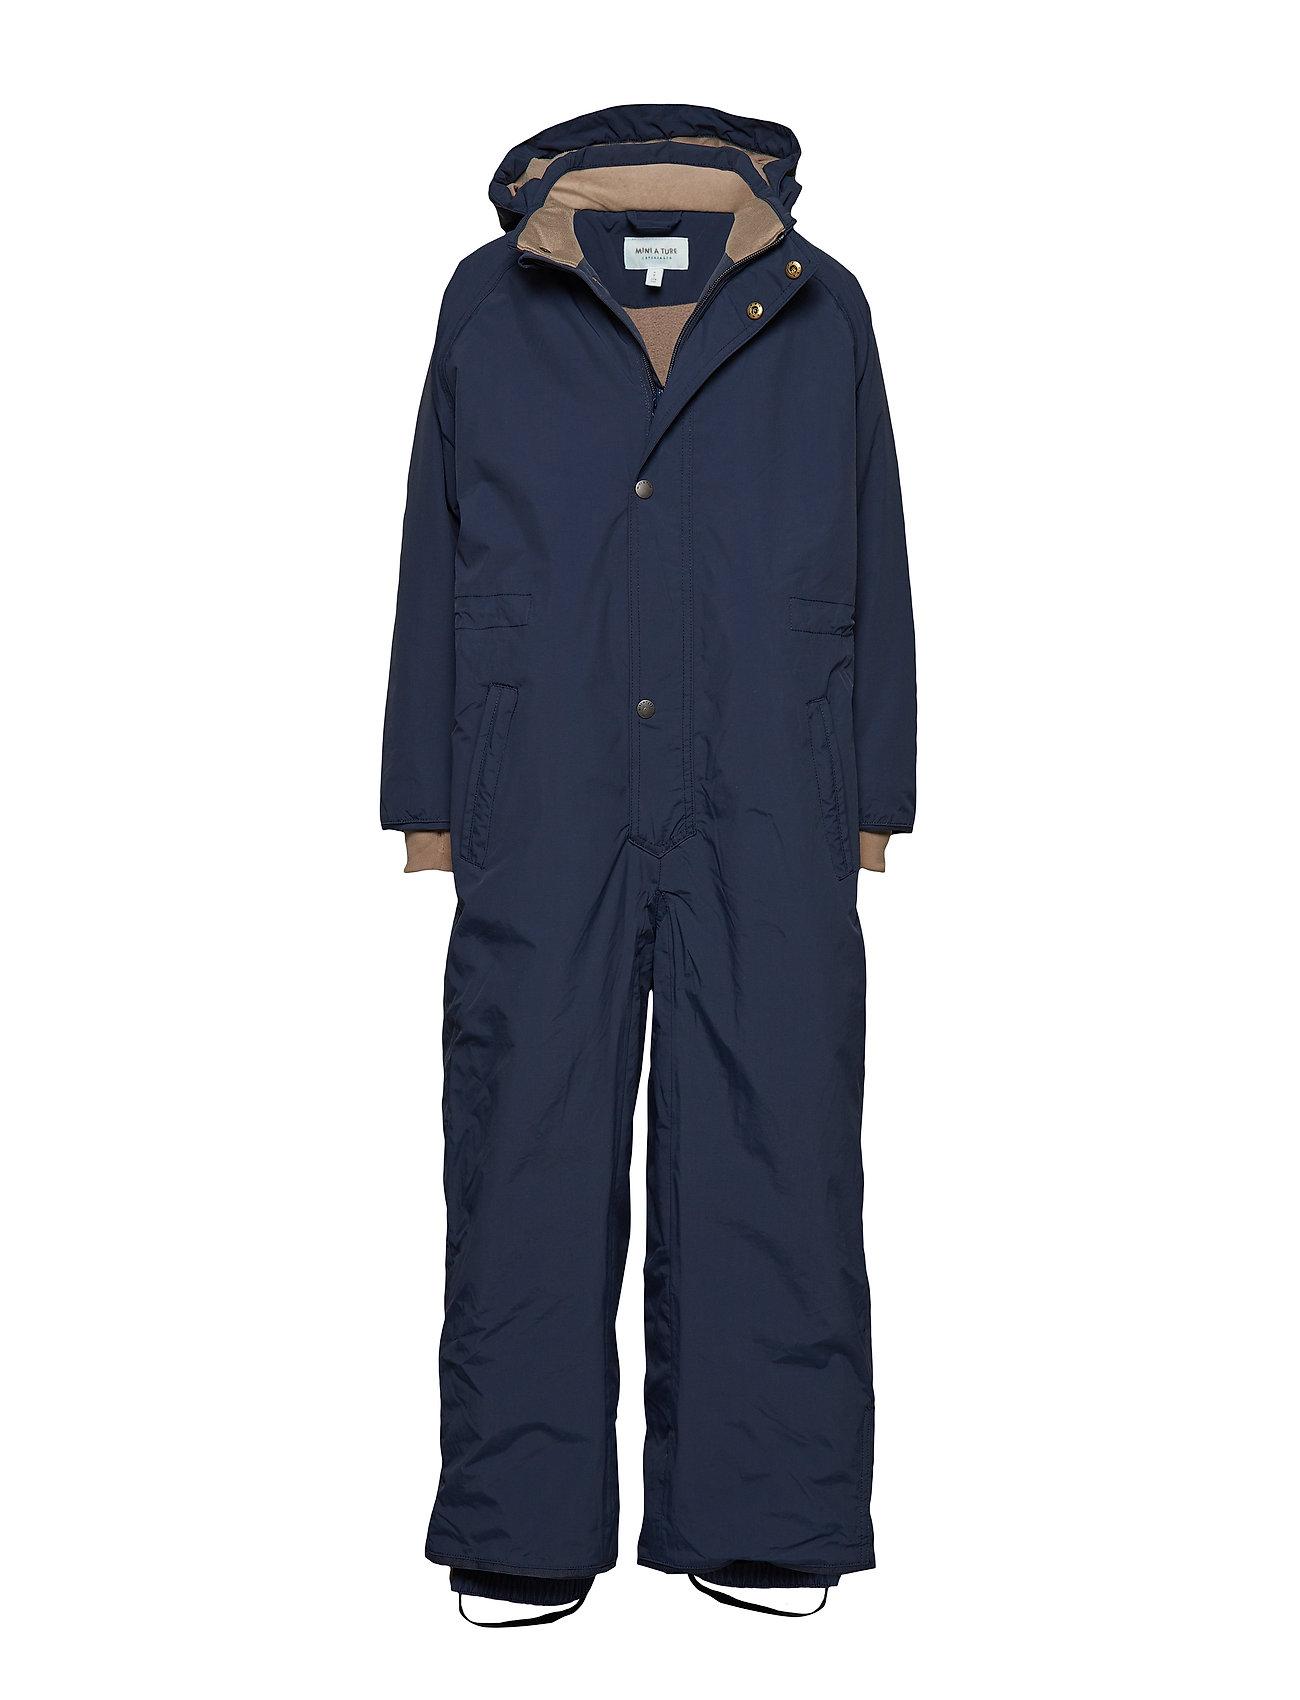 Mini A Ture Wanni Snowsuit, K - PEACOAT BLUE